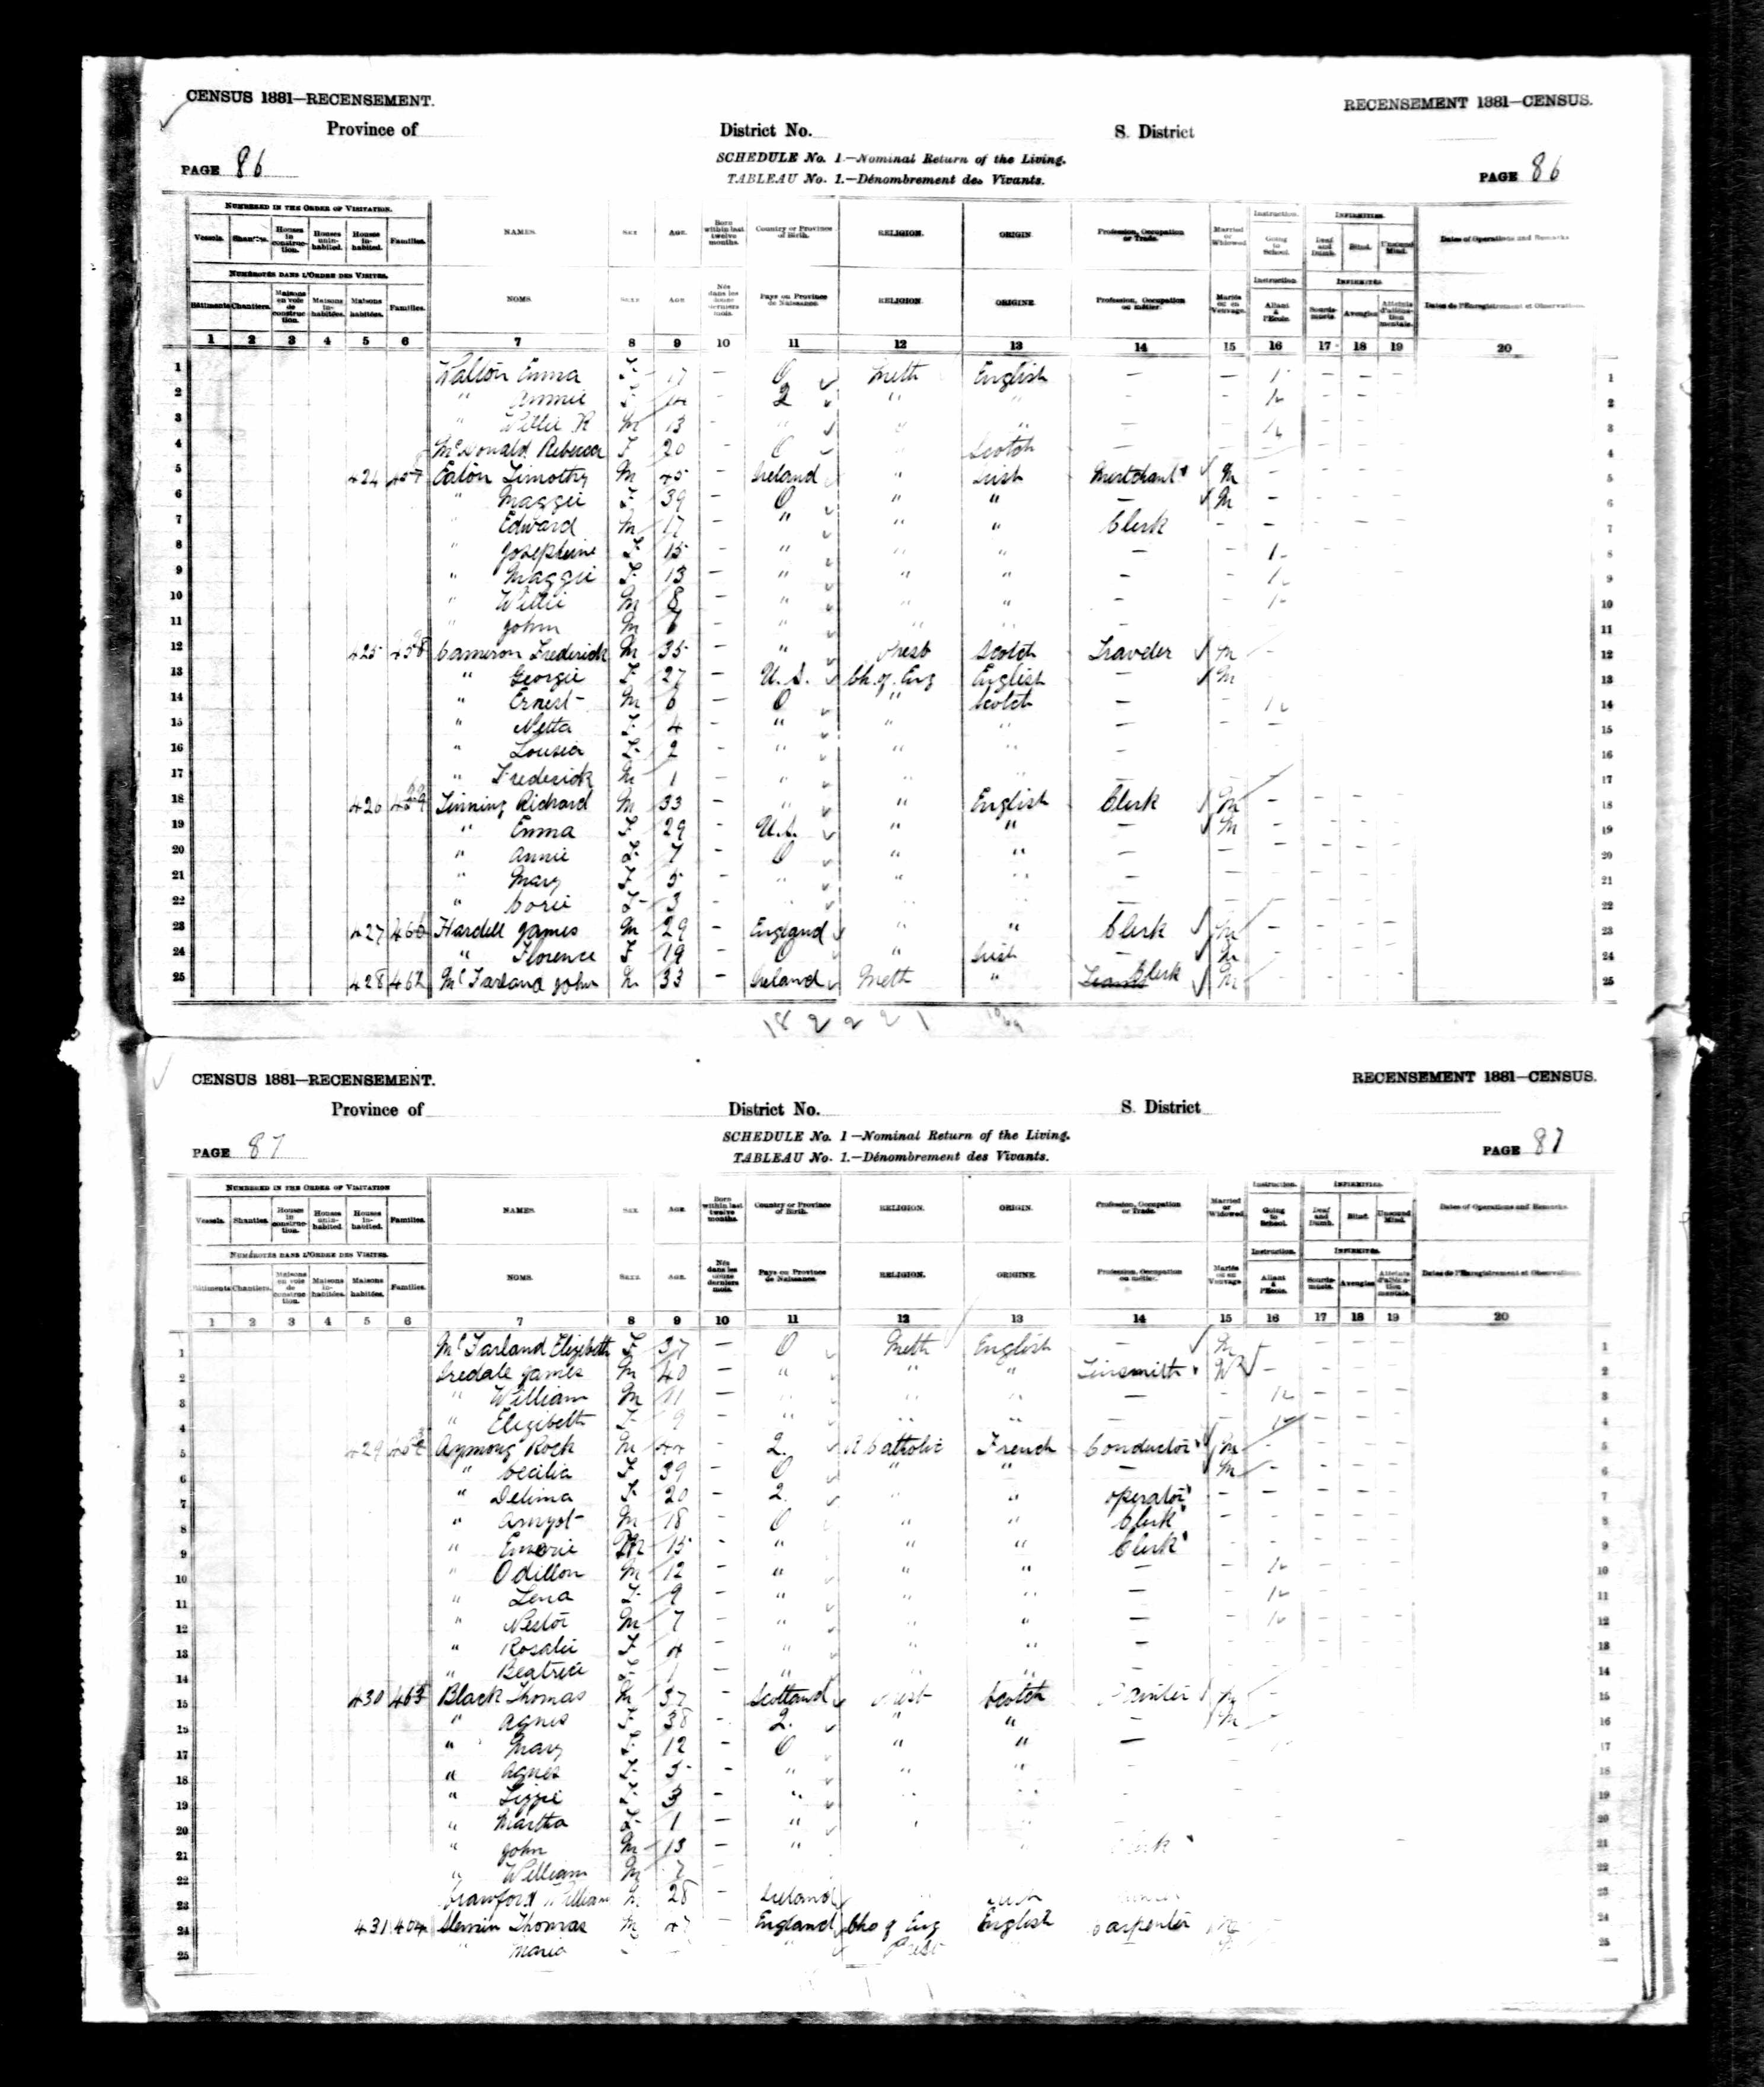 https://s3-eu-west-1.amazonaws.com/waltongeni/1881+Census+George+and+Elizabeth+Walton+pg+2+of+2.jpg